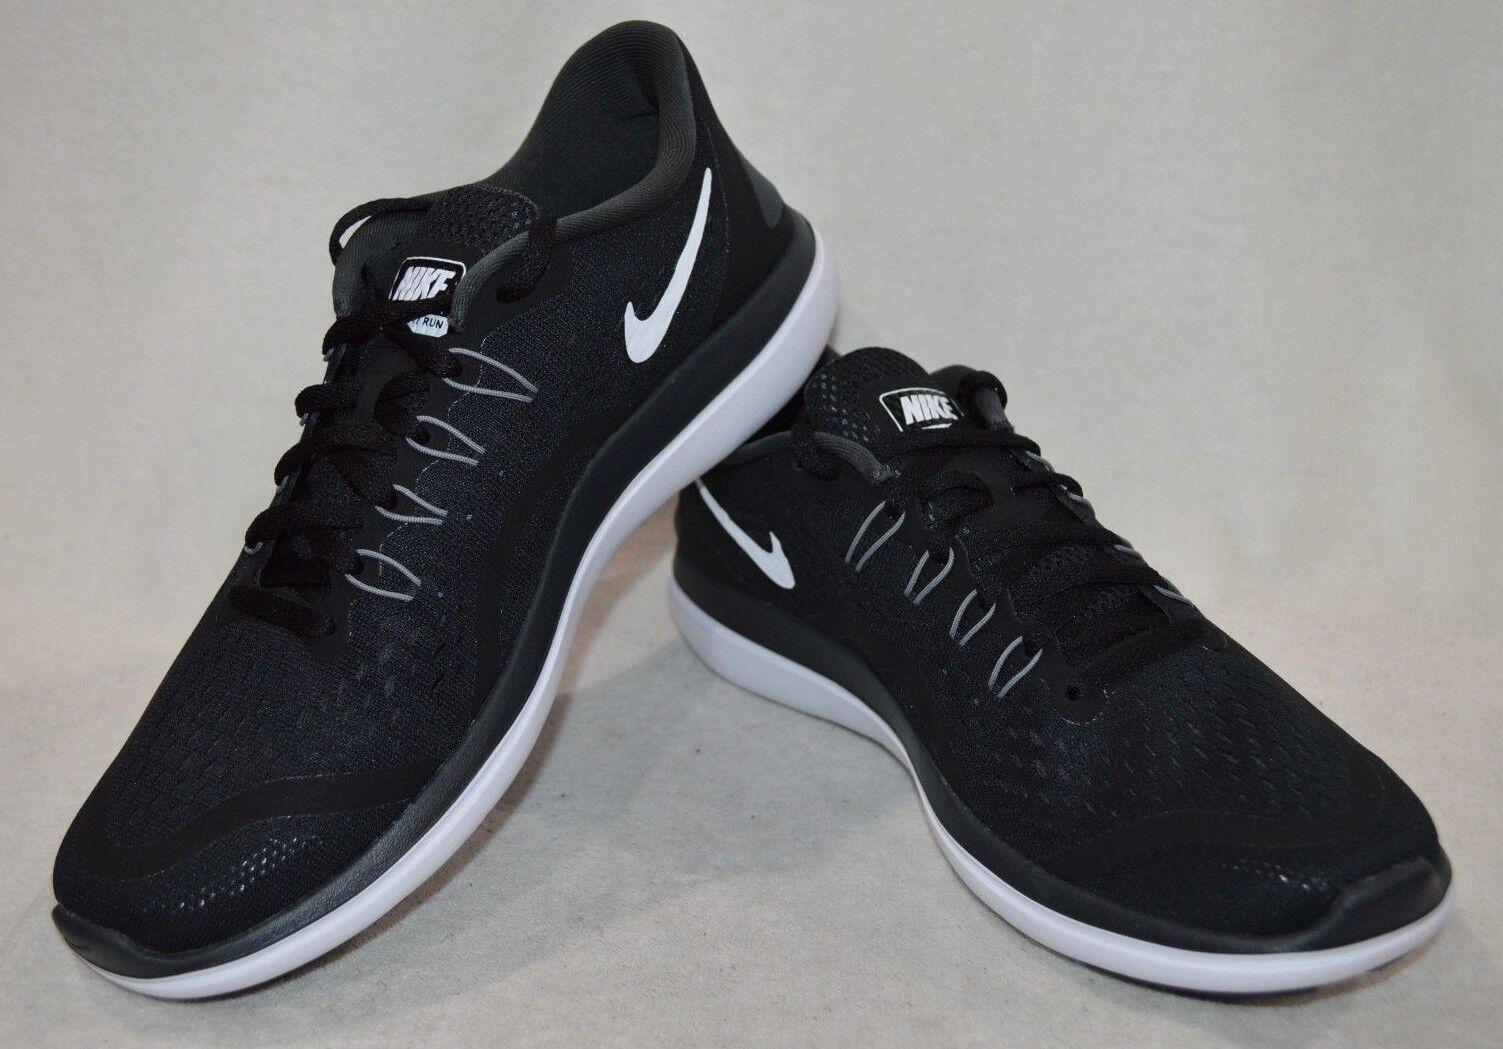 Nike air max lebron james 454141 sldr sldr sldr v / dimensioni 14 bianco e rosso del 2011 7a6360